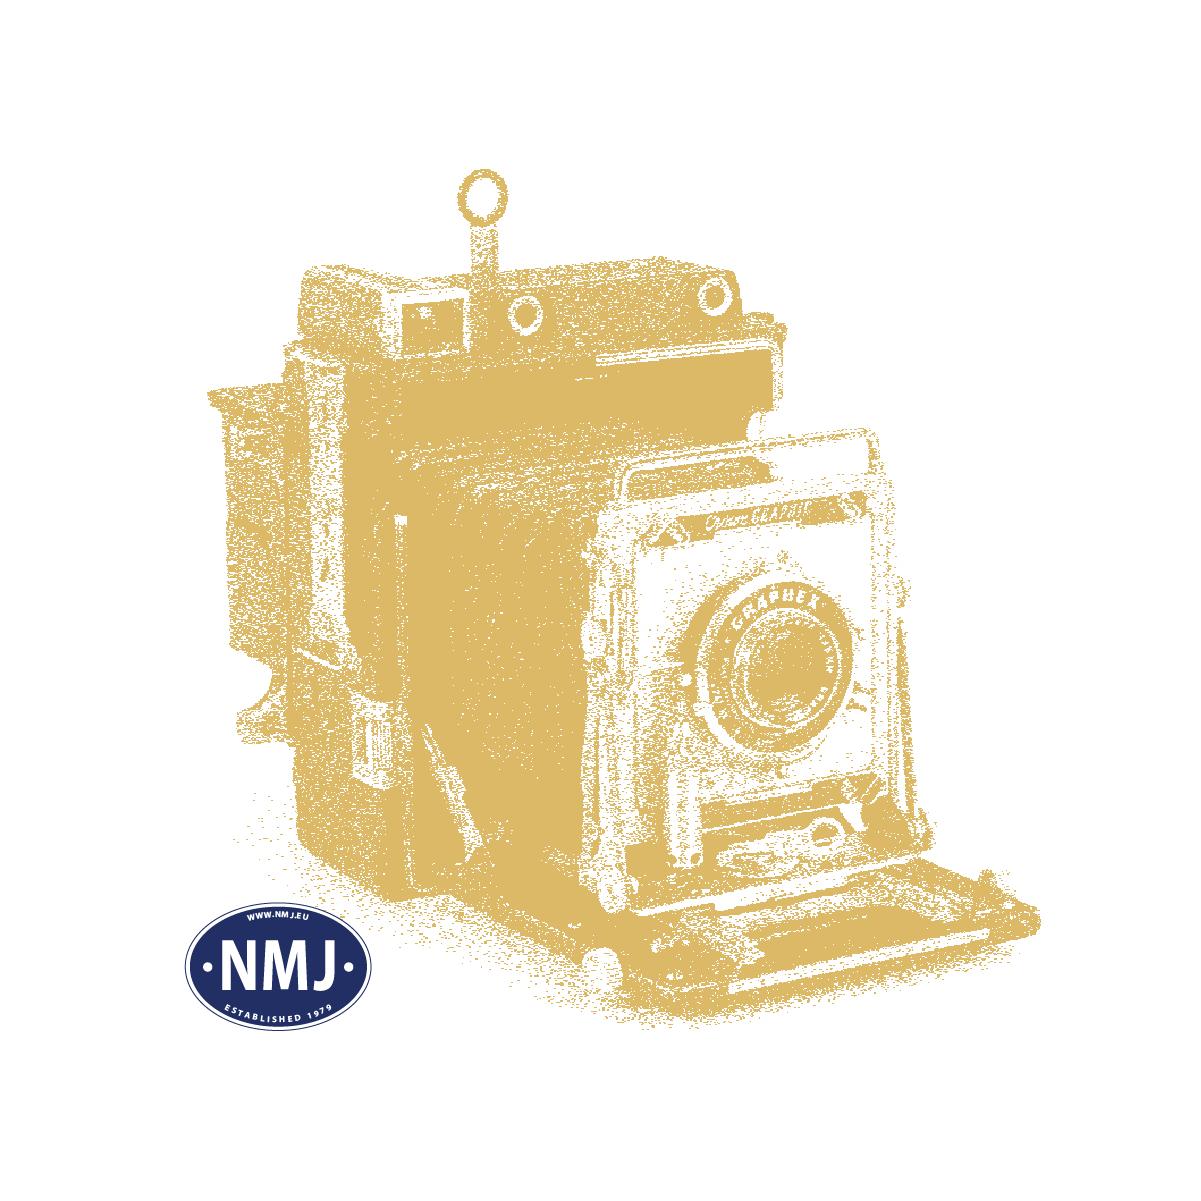 NMJT81.401 - NMJ Topline NSB BM73, rot/silber/grau/orange, DC